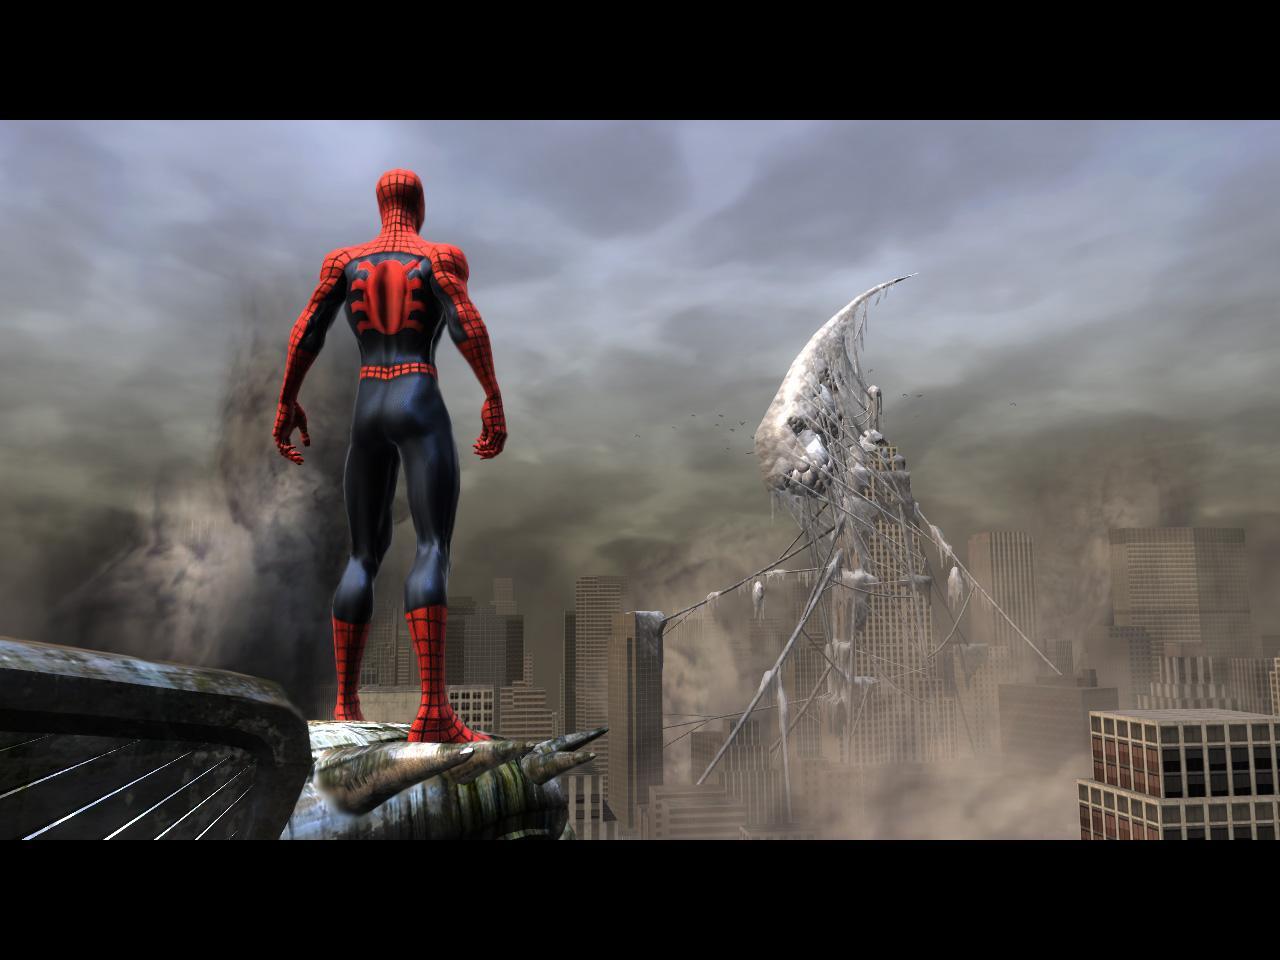 Spider man web of shadows desktop wallpaper